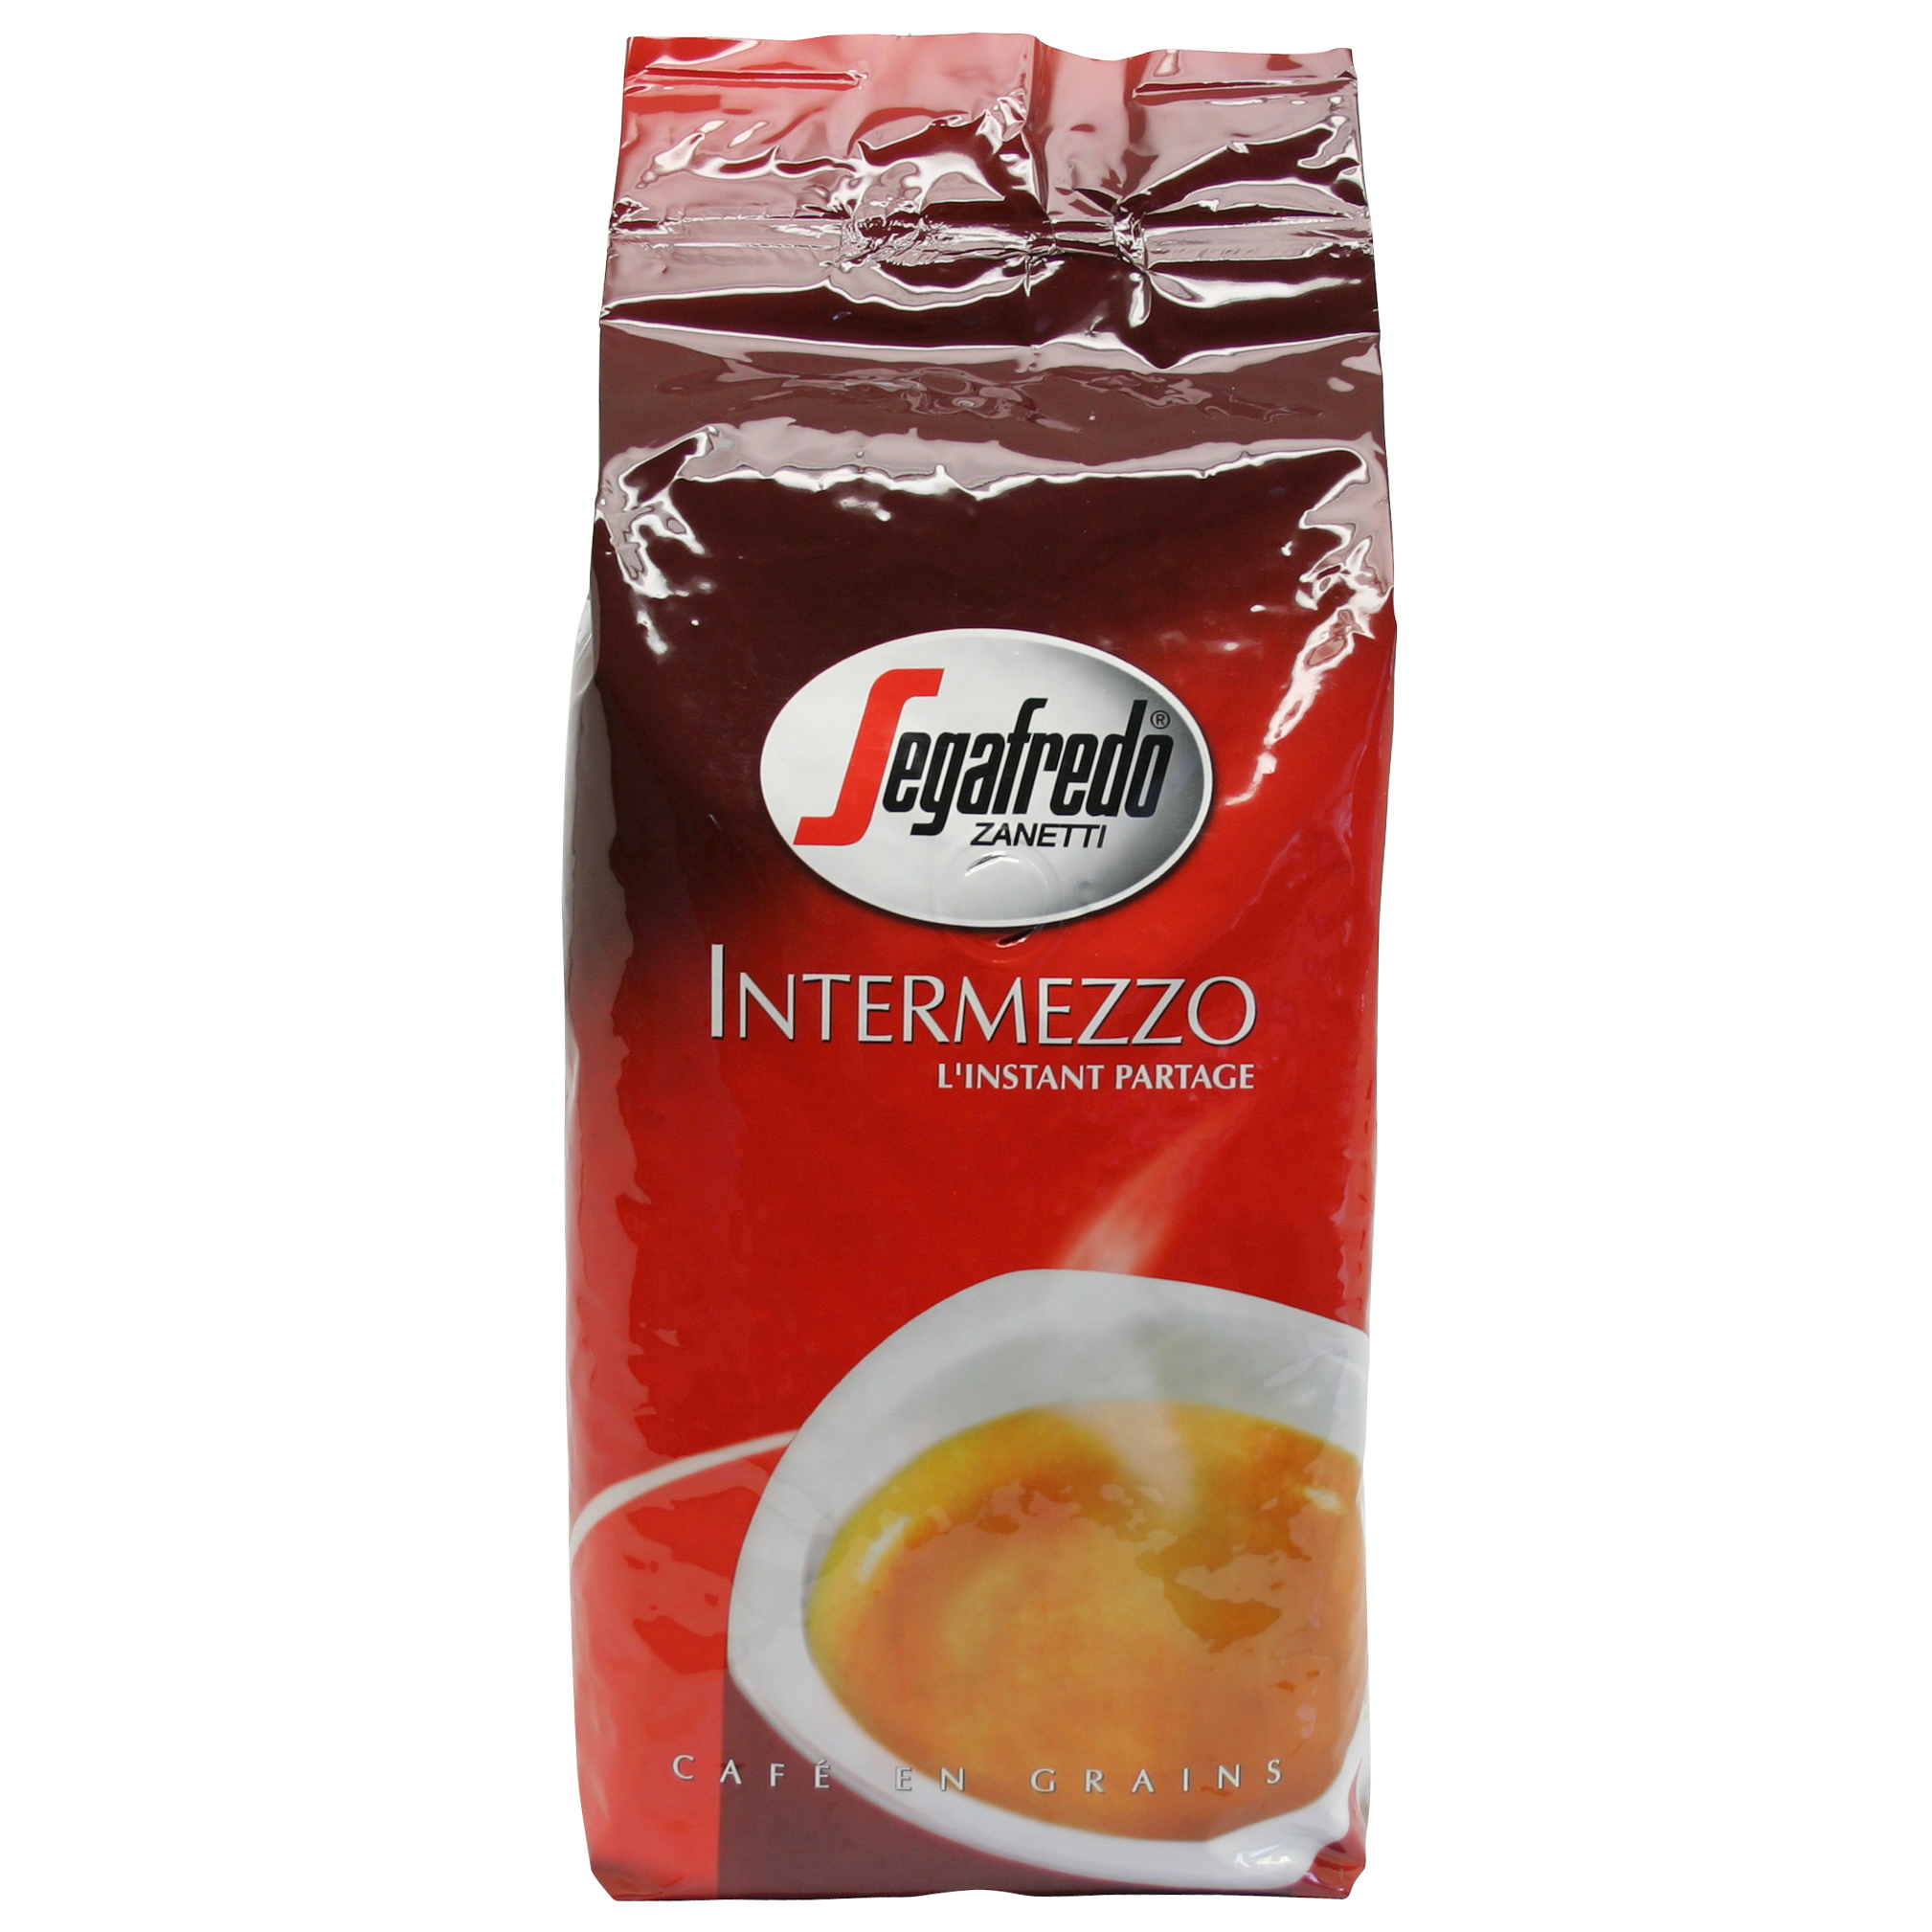 segafredo intermezzo2